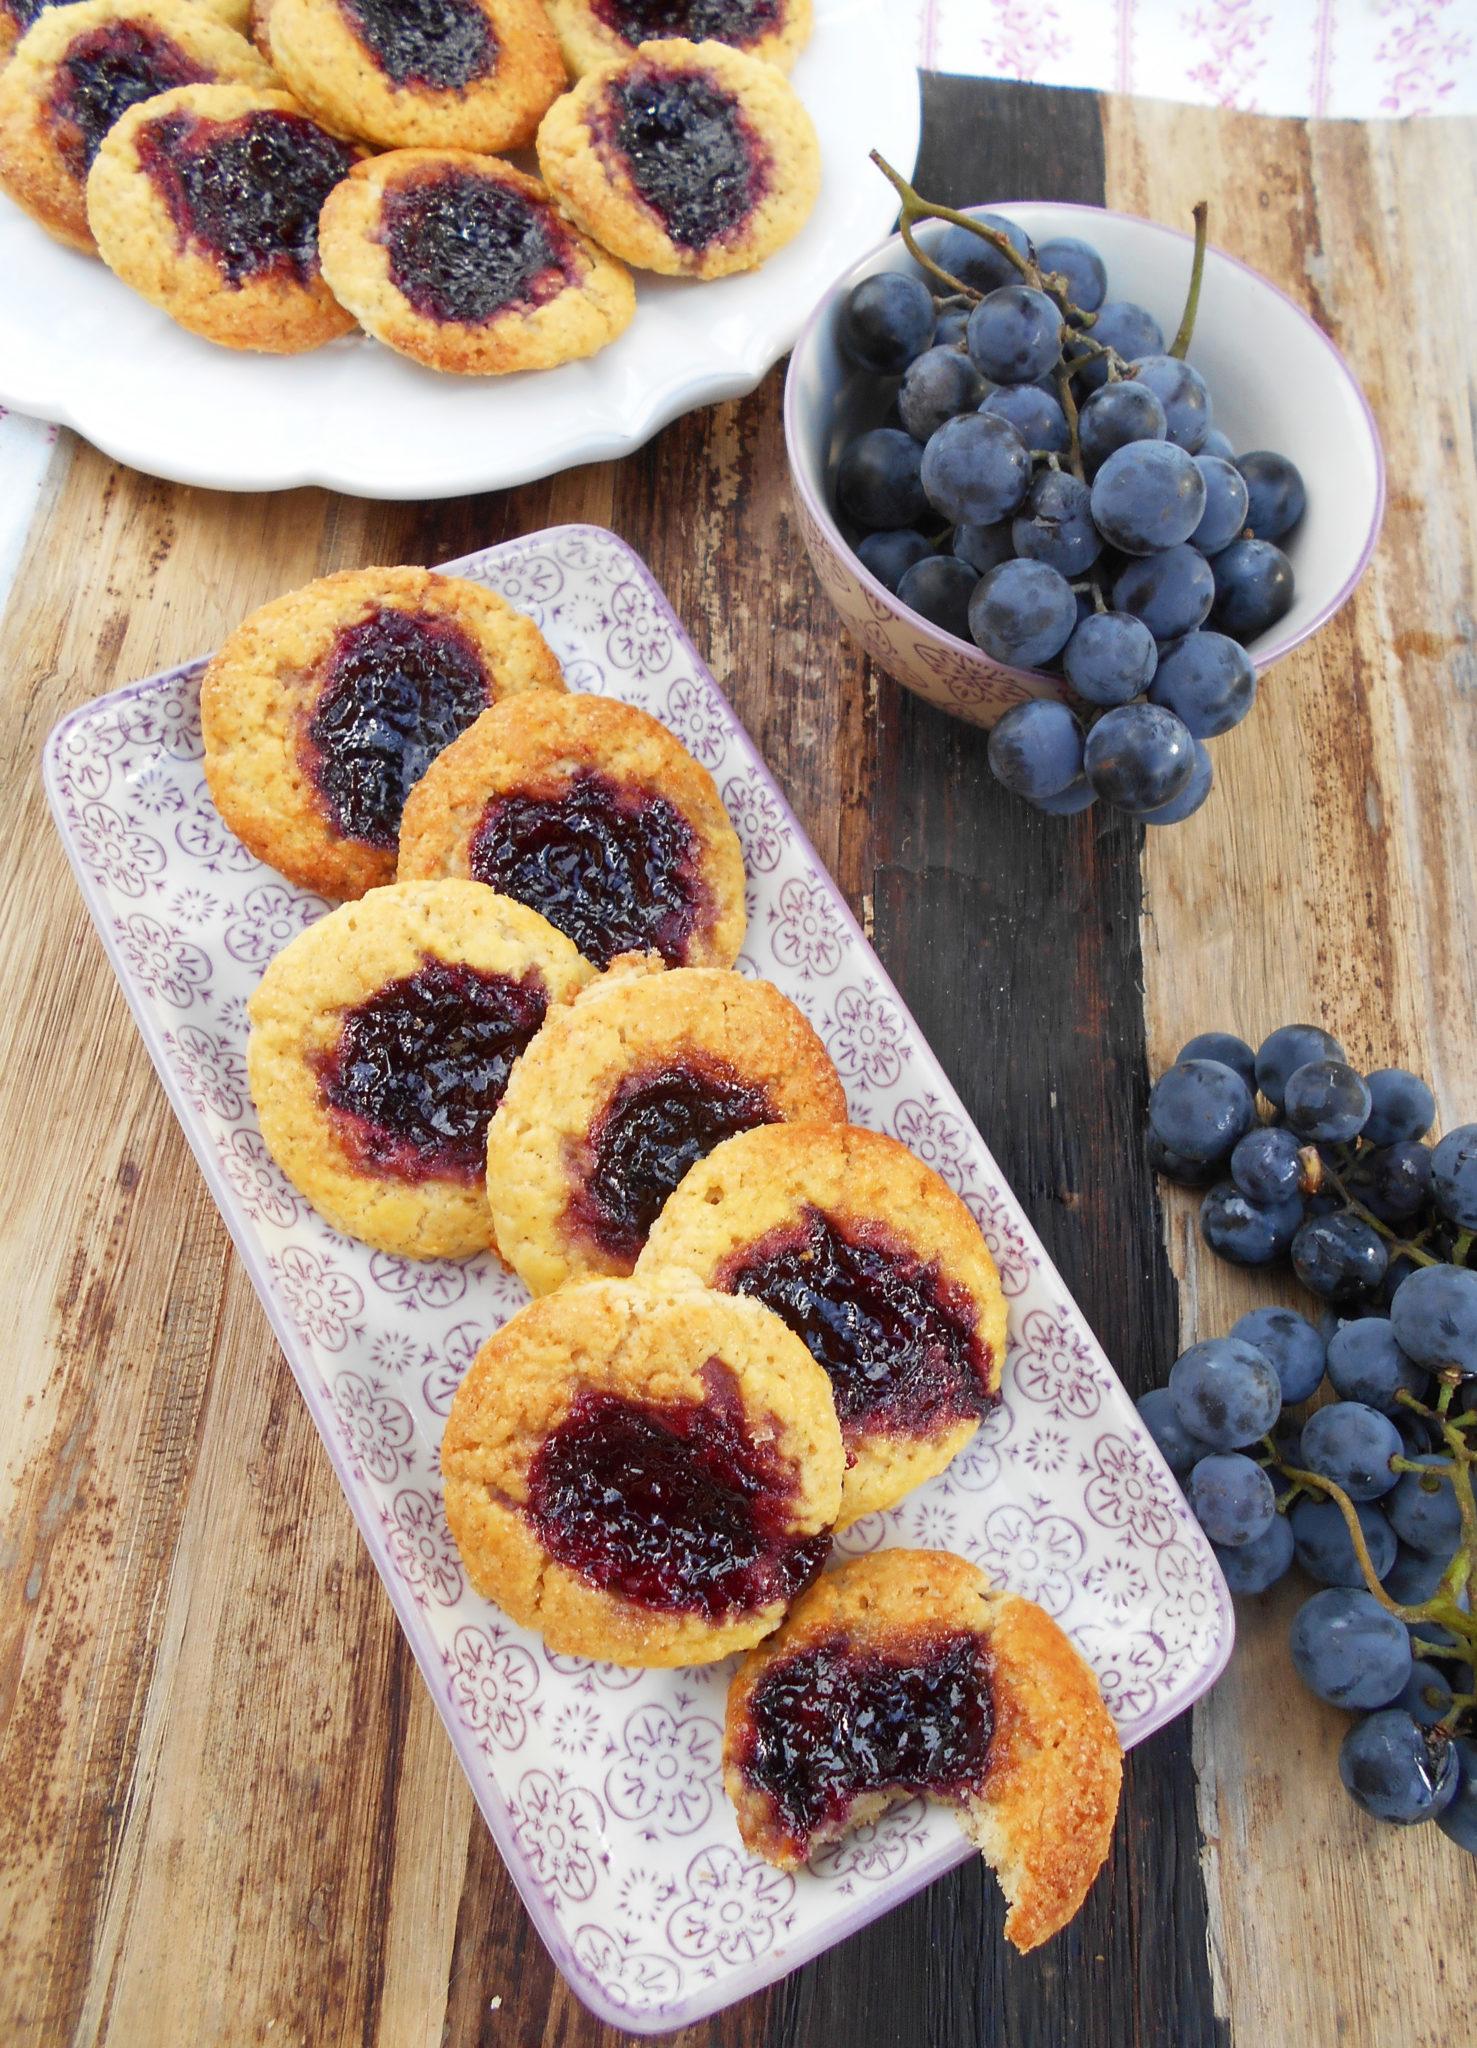 Home Baked! Süße Marmeladen-Taler